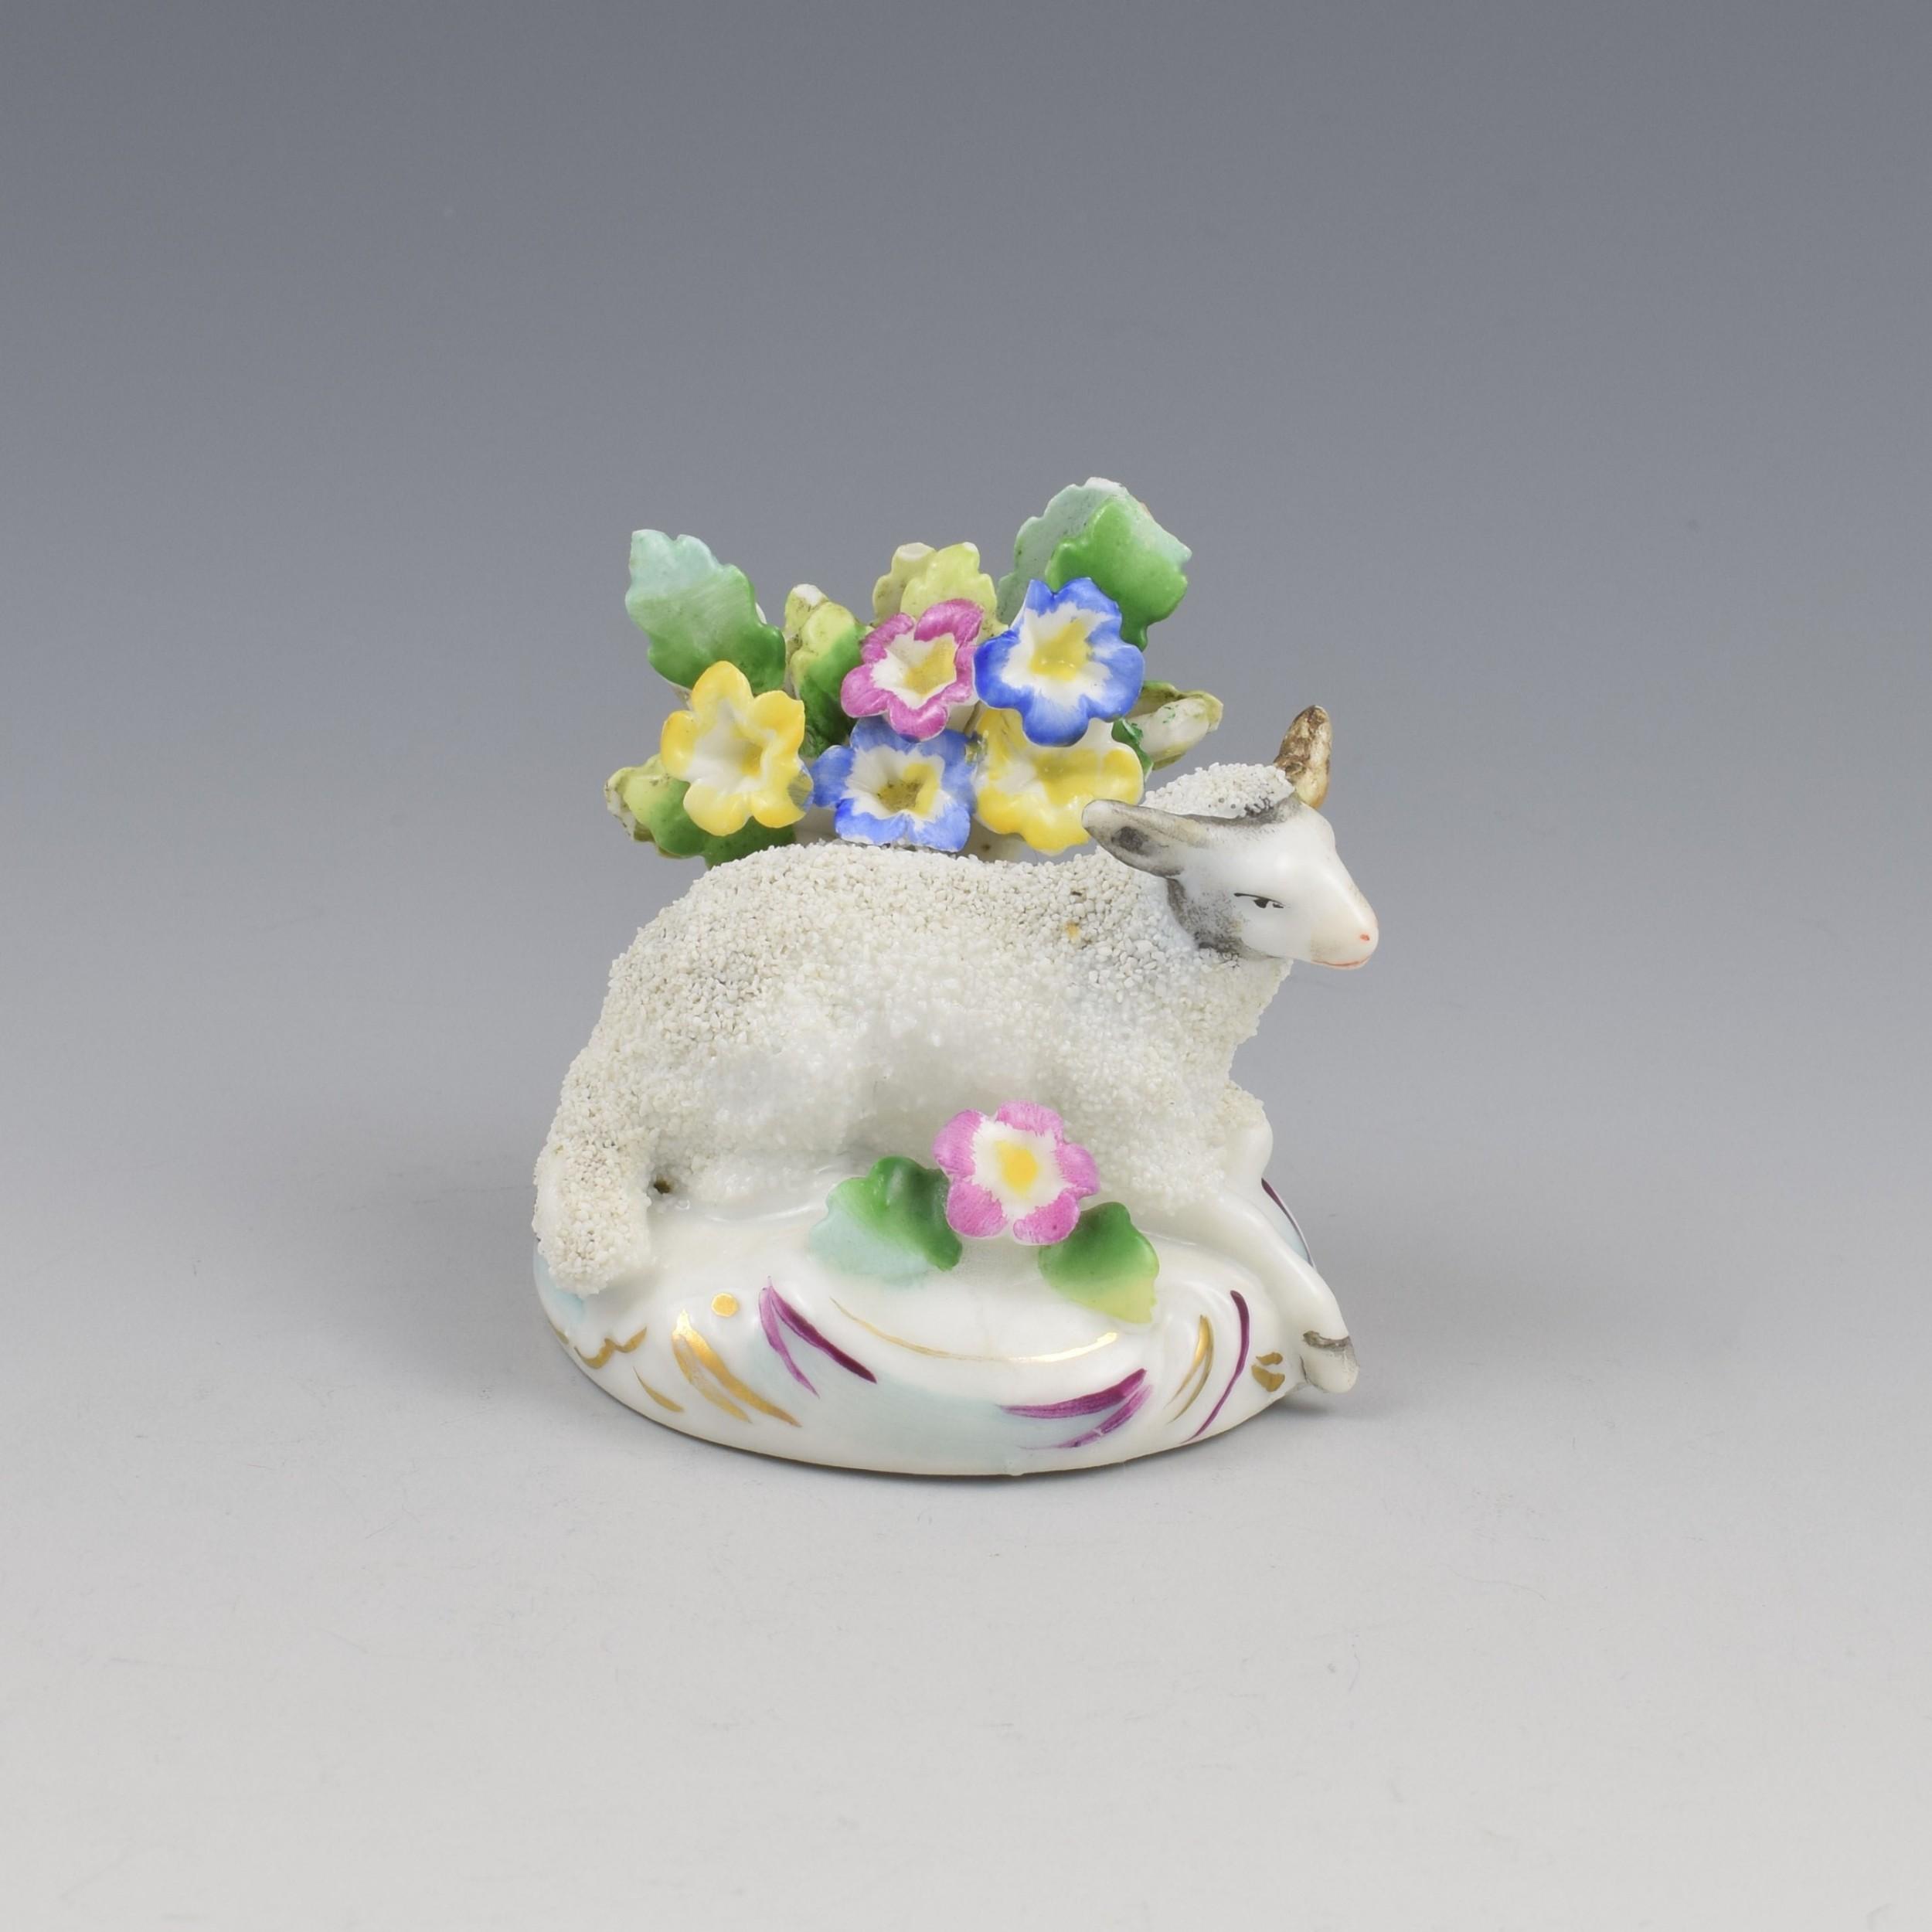 samson of paris french porcelain figure of a sheep